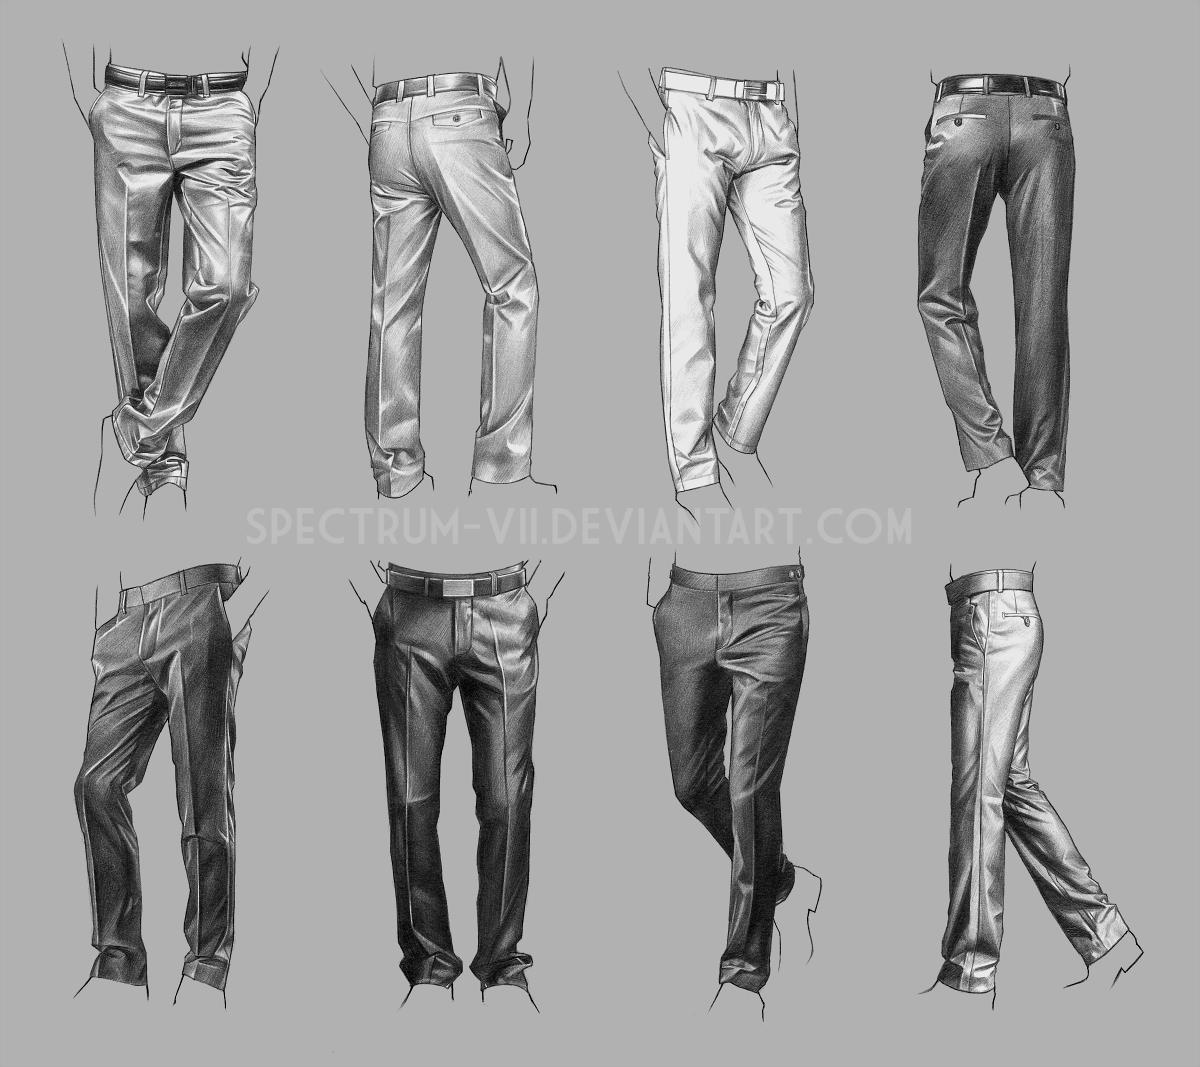 A study in suit pants by Spectrum-VII.deviantart.com on @deviantART